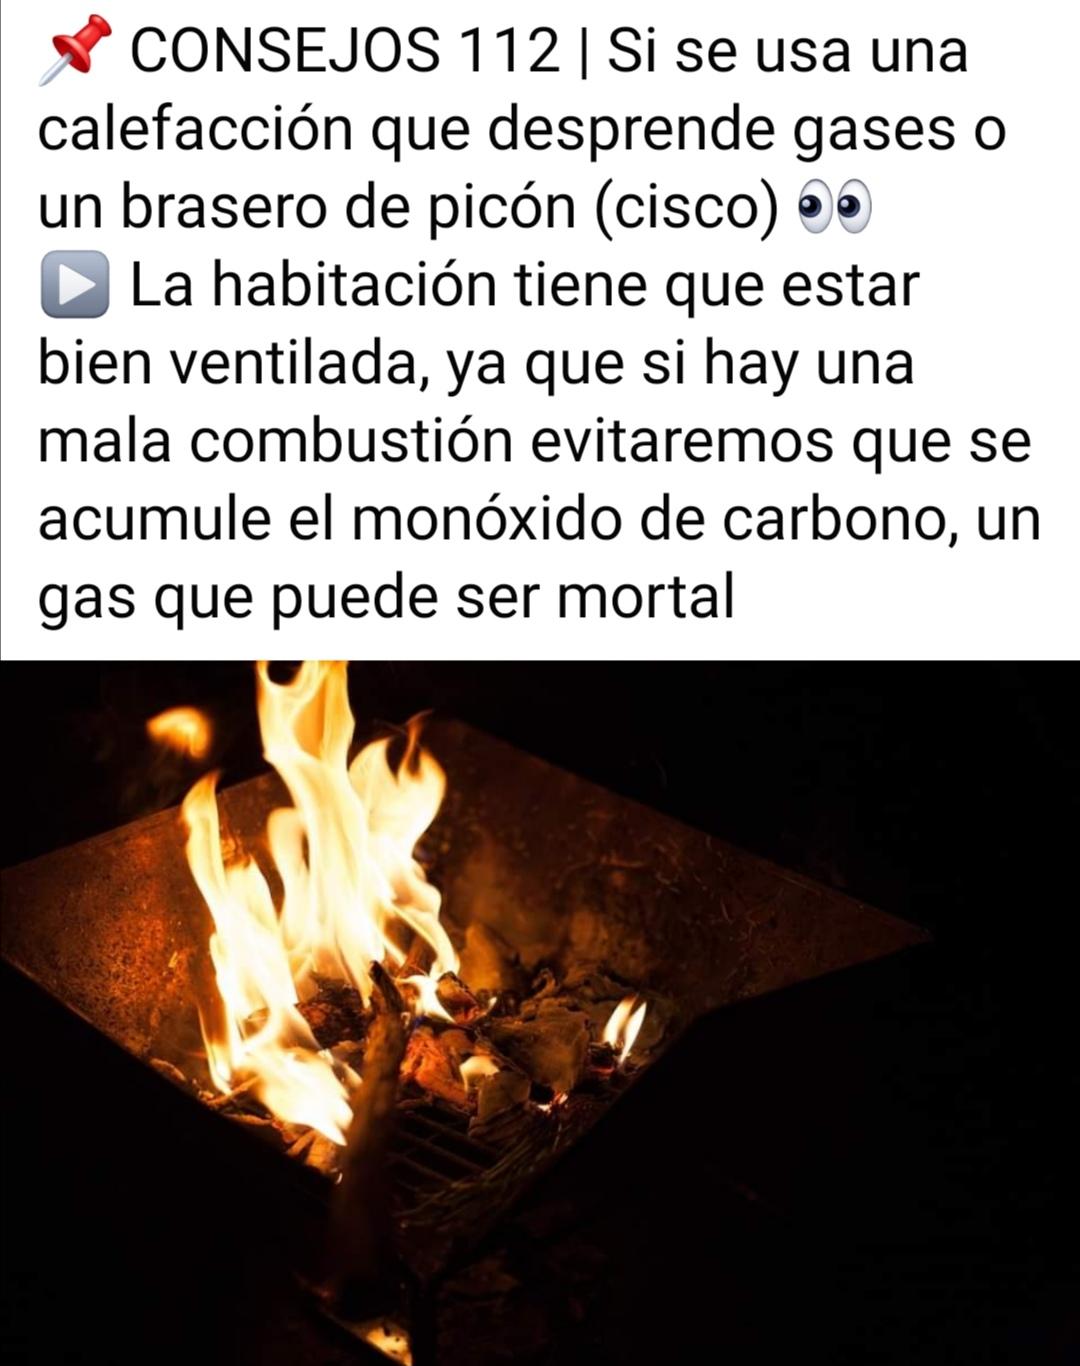 https://www.palmadelrio.es/sites/default/files/fuego_2.jpg